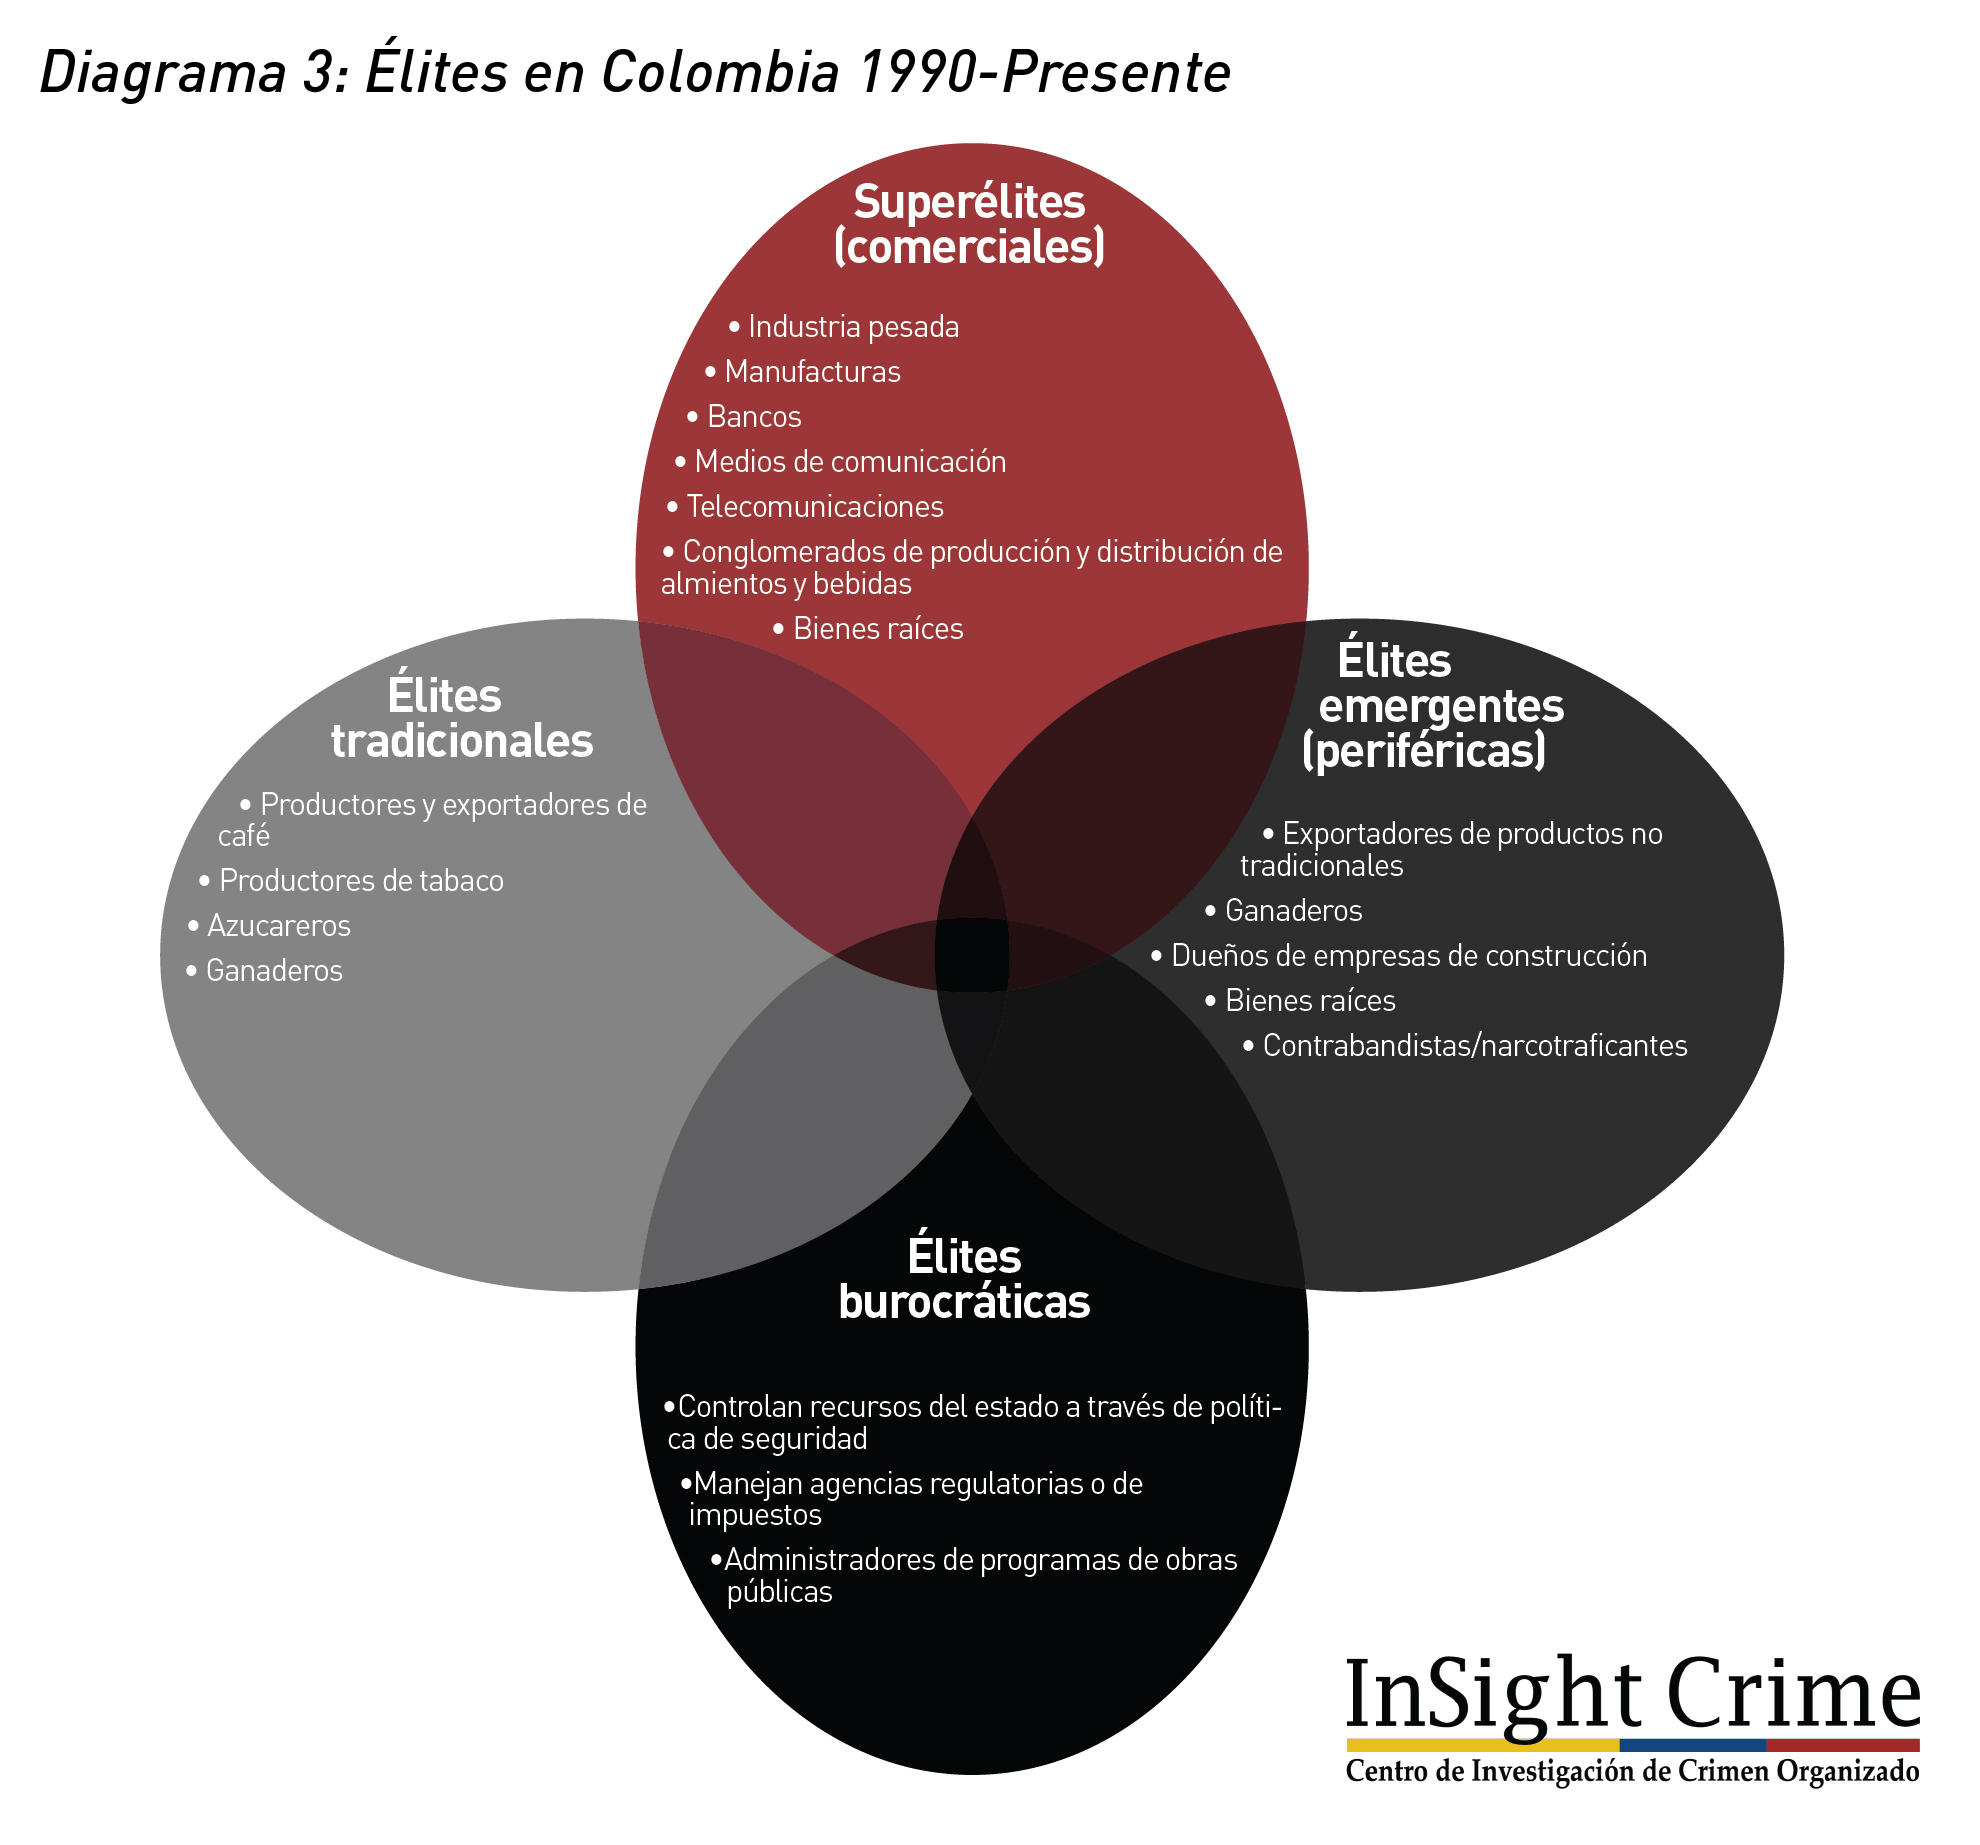 Diagrama3 Colombia Elite 1990 presente